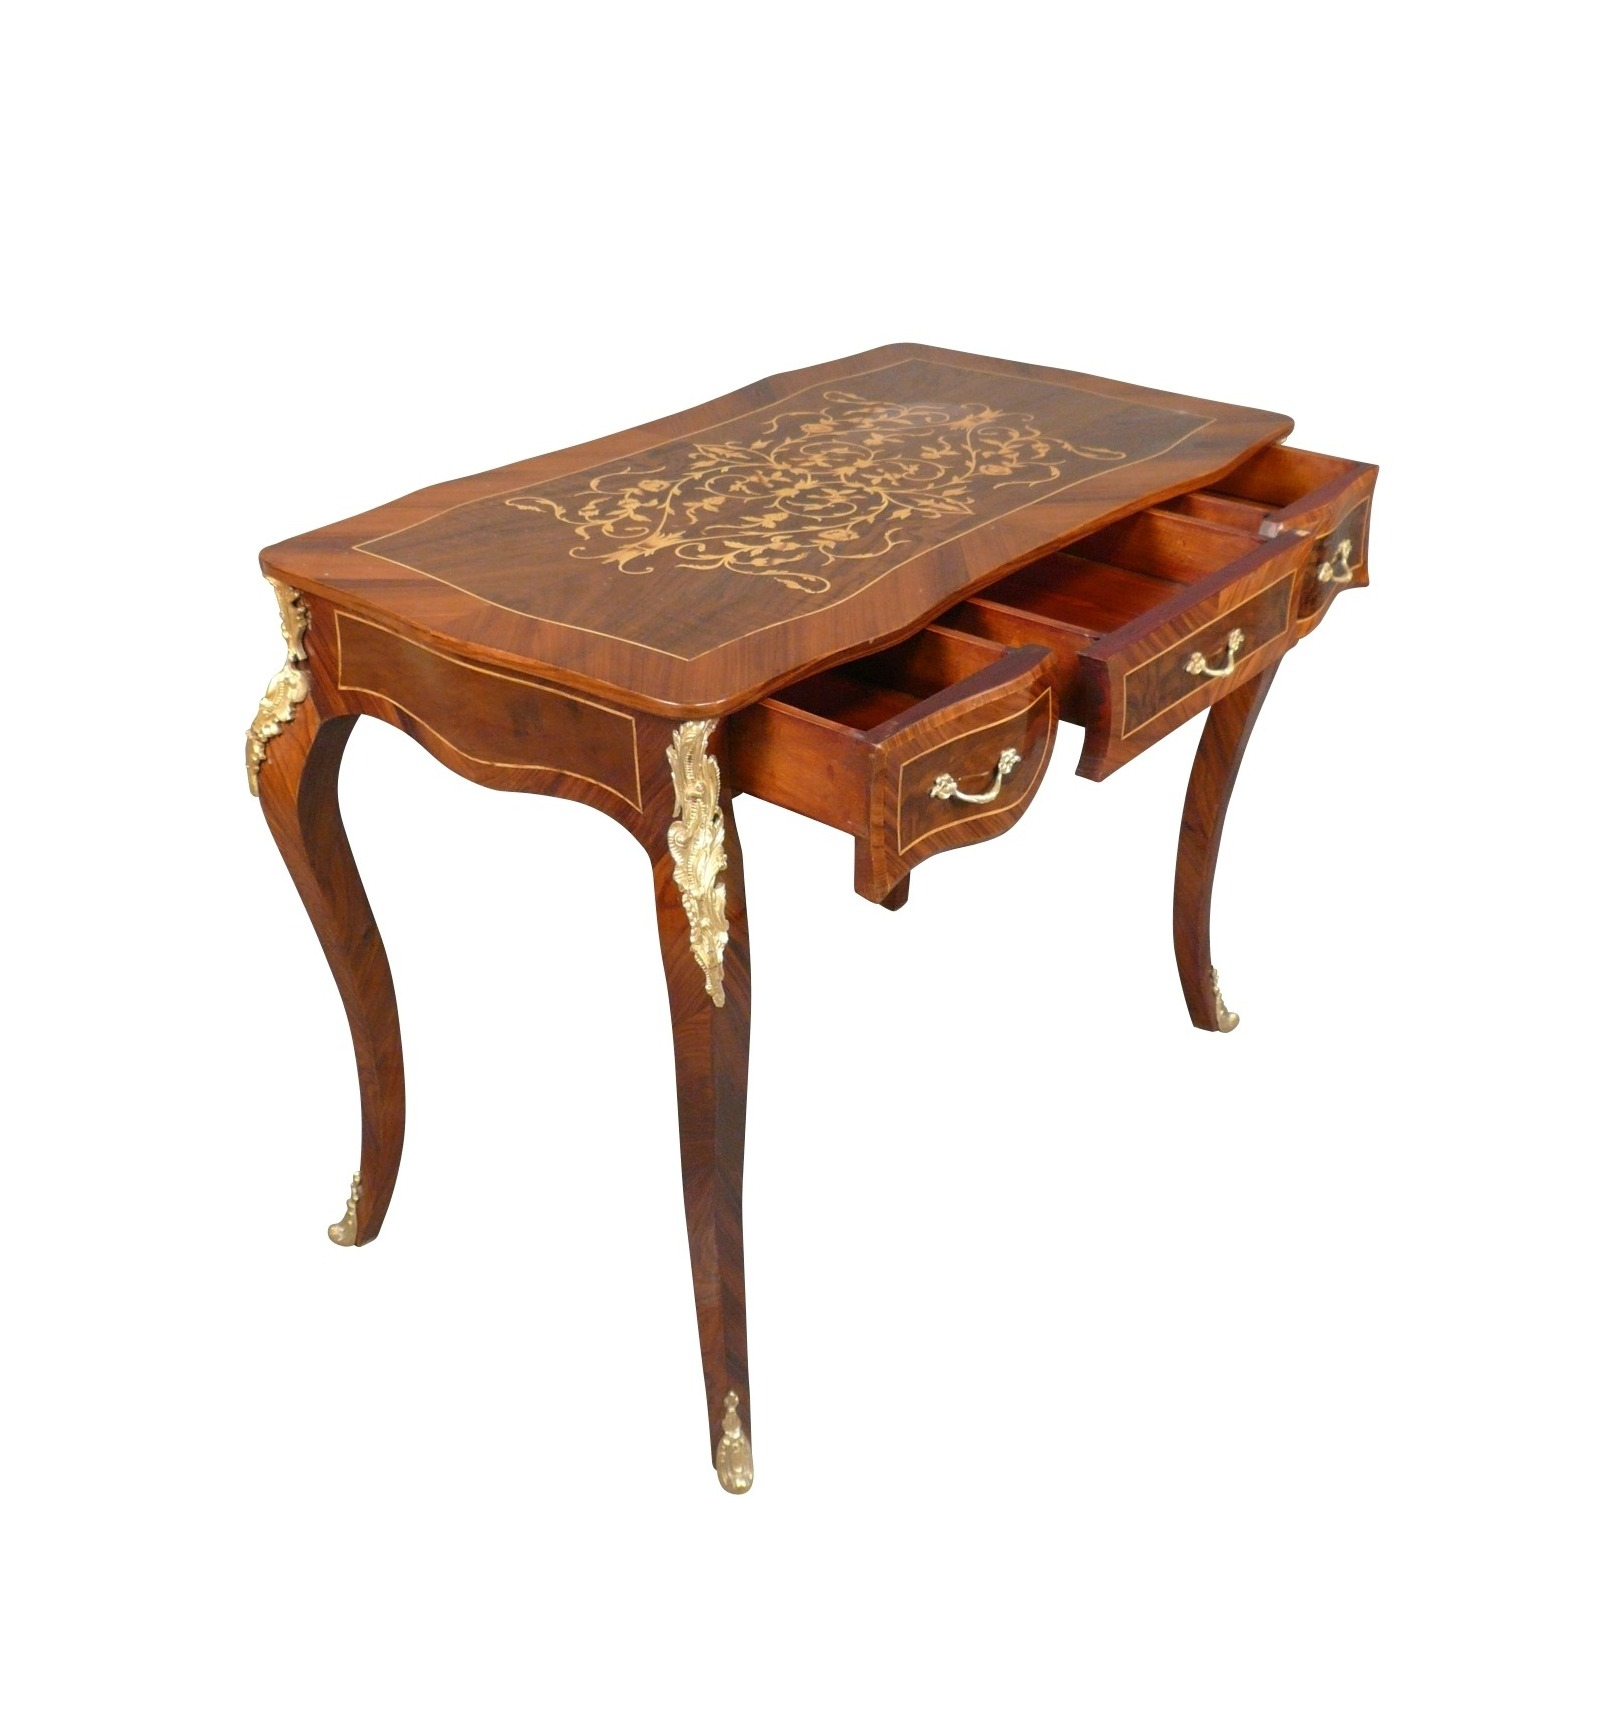 Bureau louis xv meubles de style - Bureau style louis xv ...